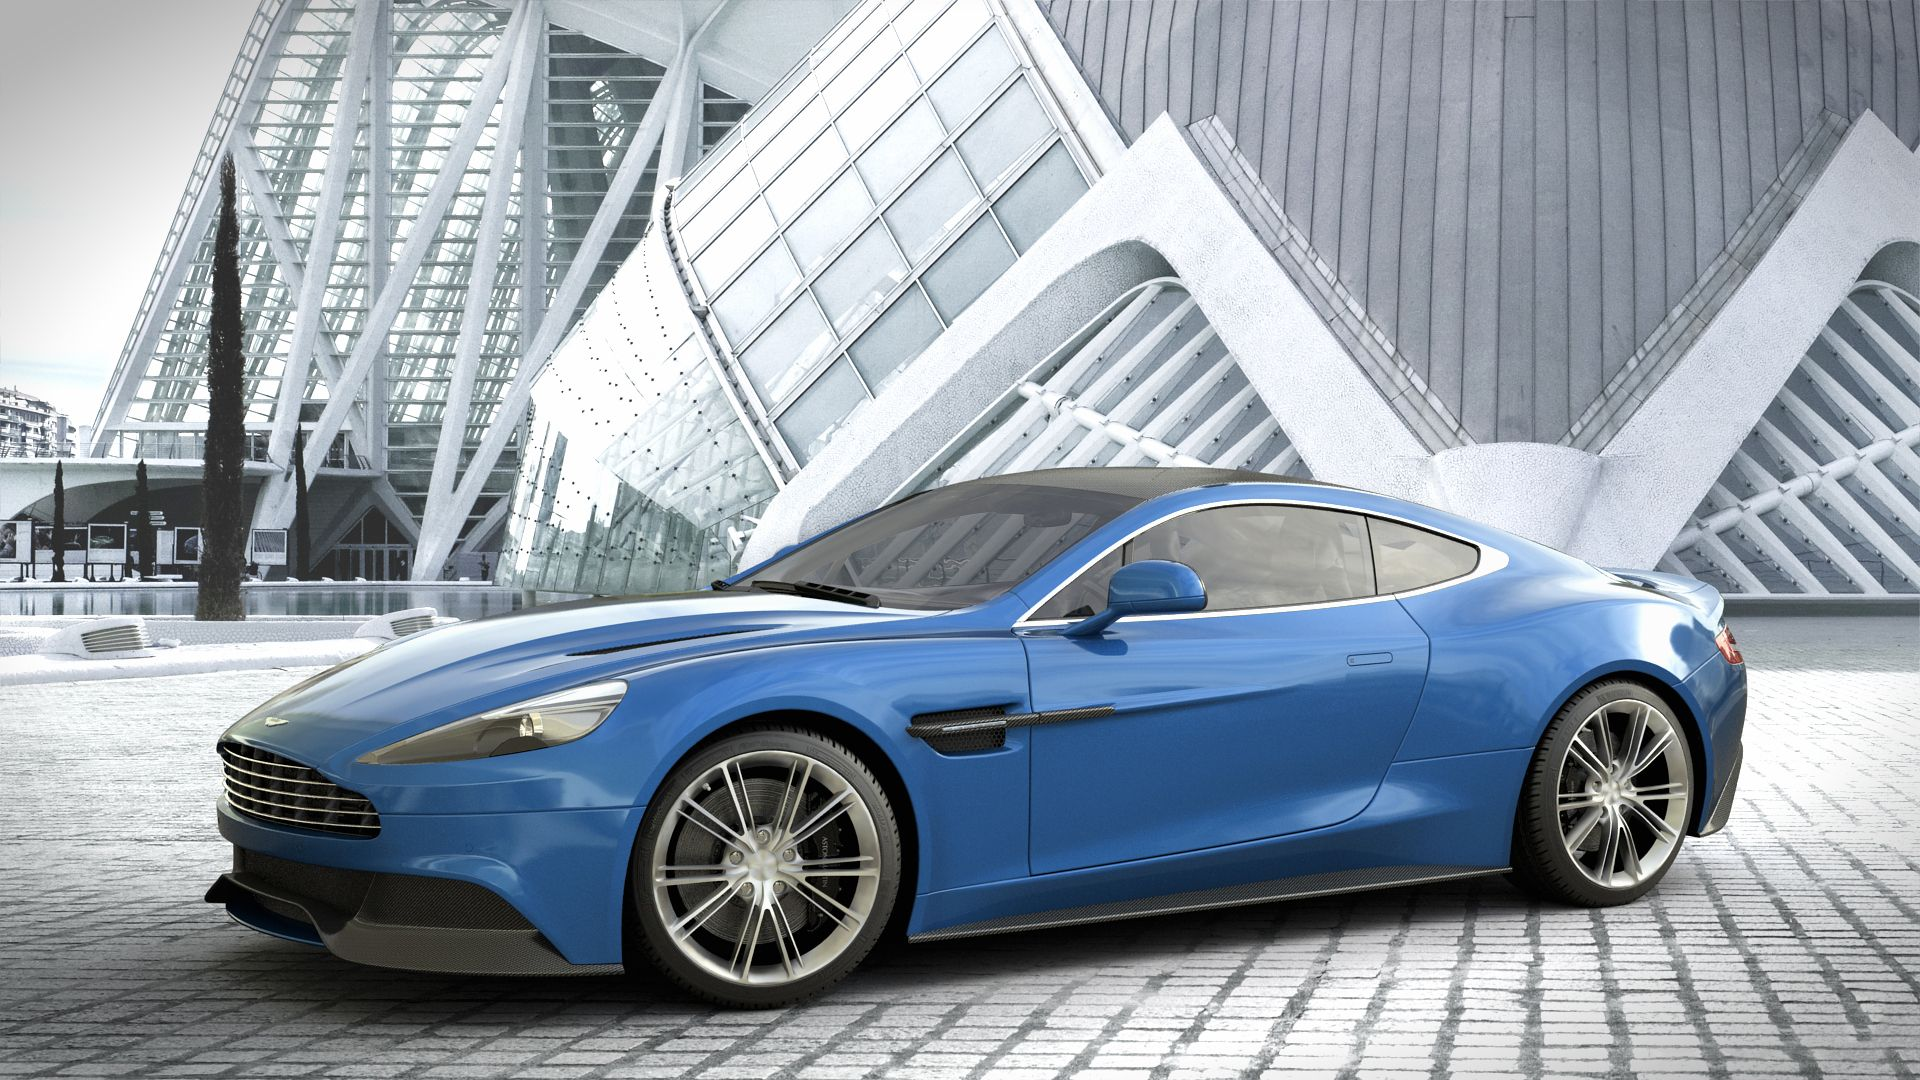 Aston Martin Vanquish Wallpaper Picture Qn